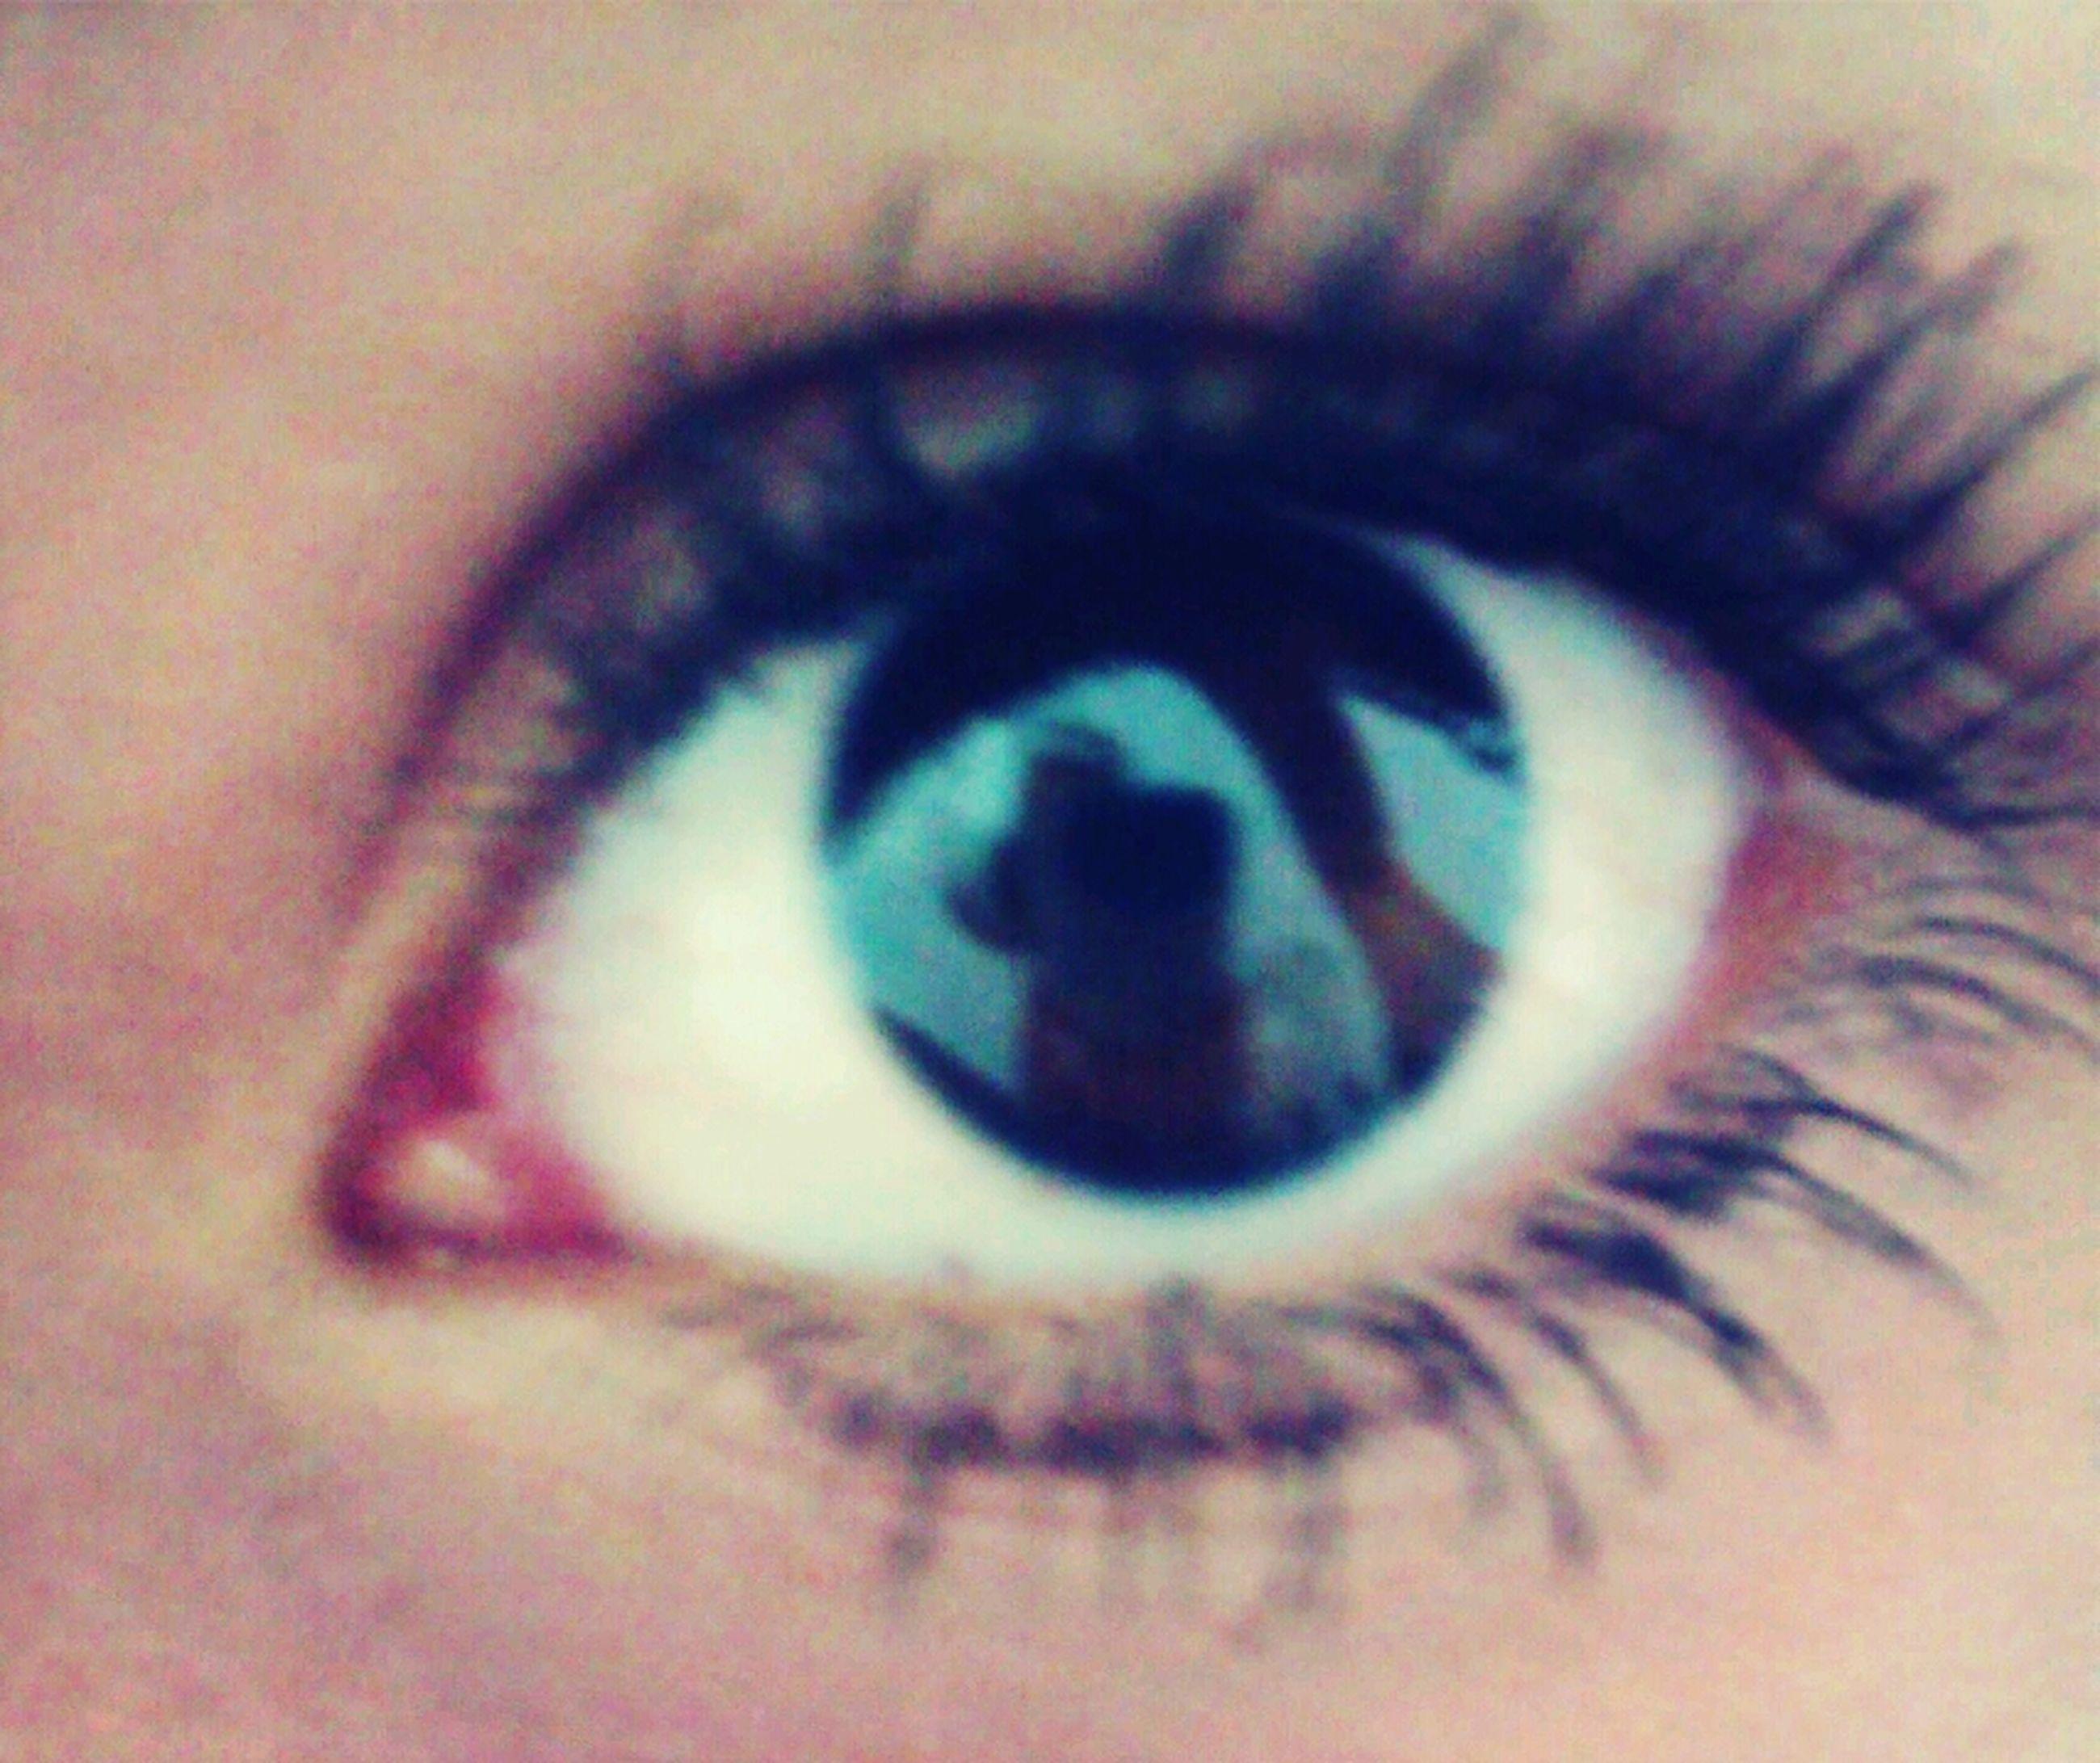 human eye, eyelash, eyesight, close-up, sensory perception, extreme close-up, eyeball, part of, human skin, iris - eye, unrecognizable person, indoors, extreme close up, person, vision, selective focus, lifestyles